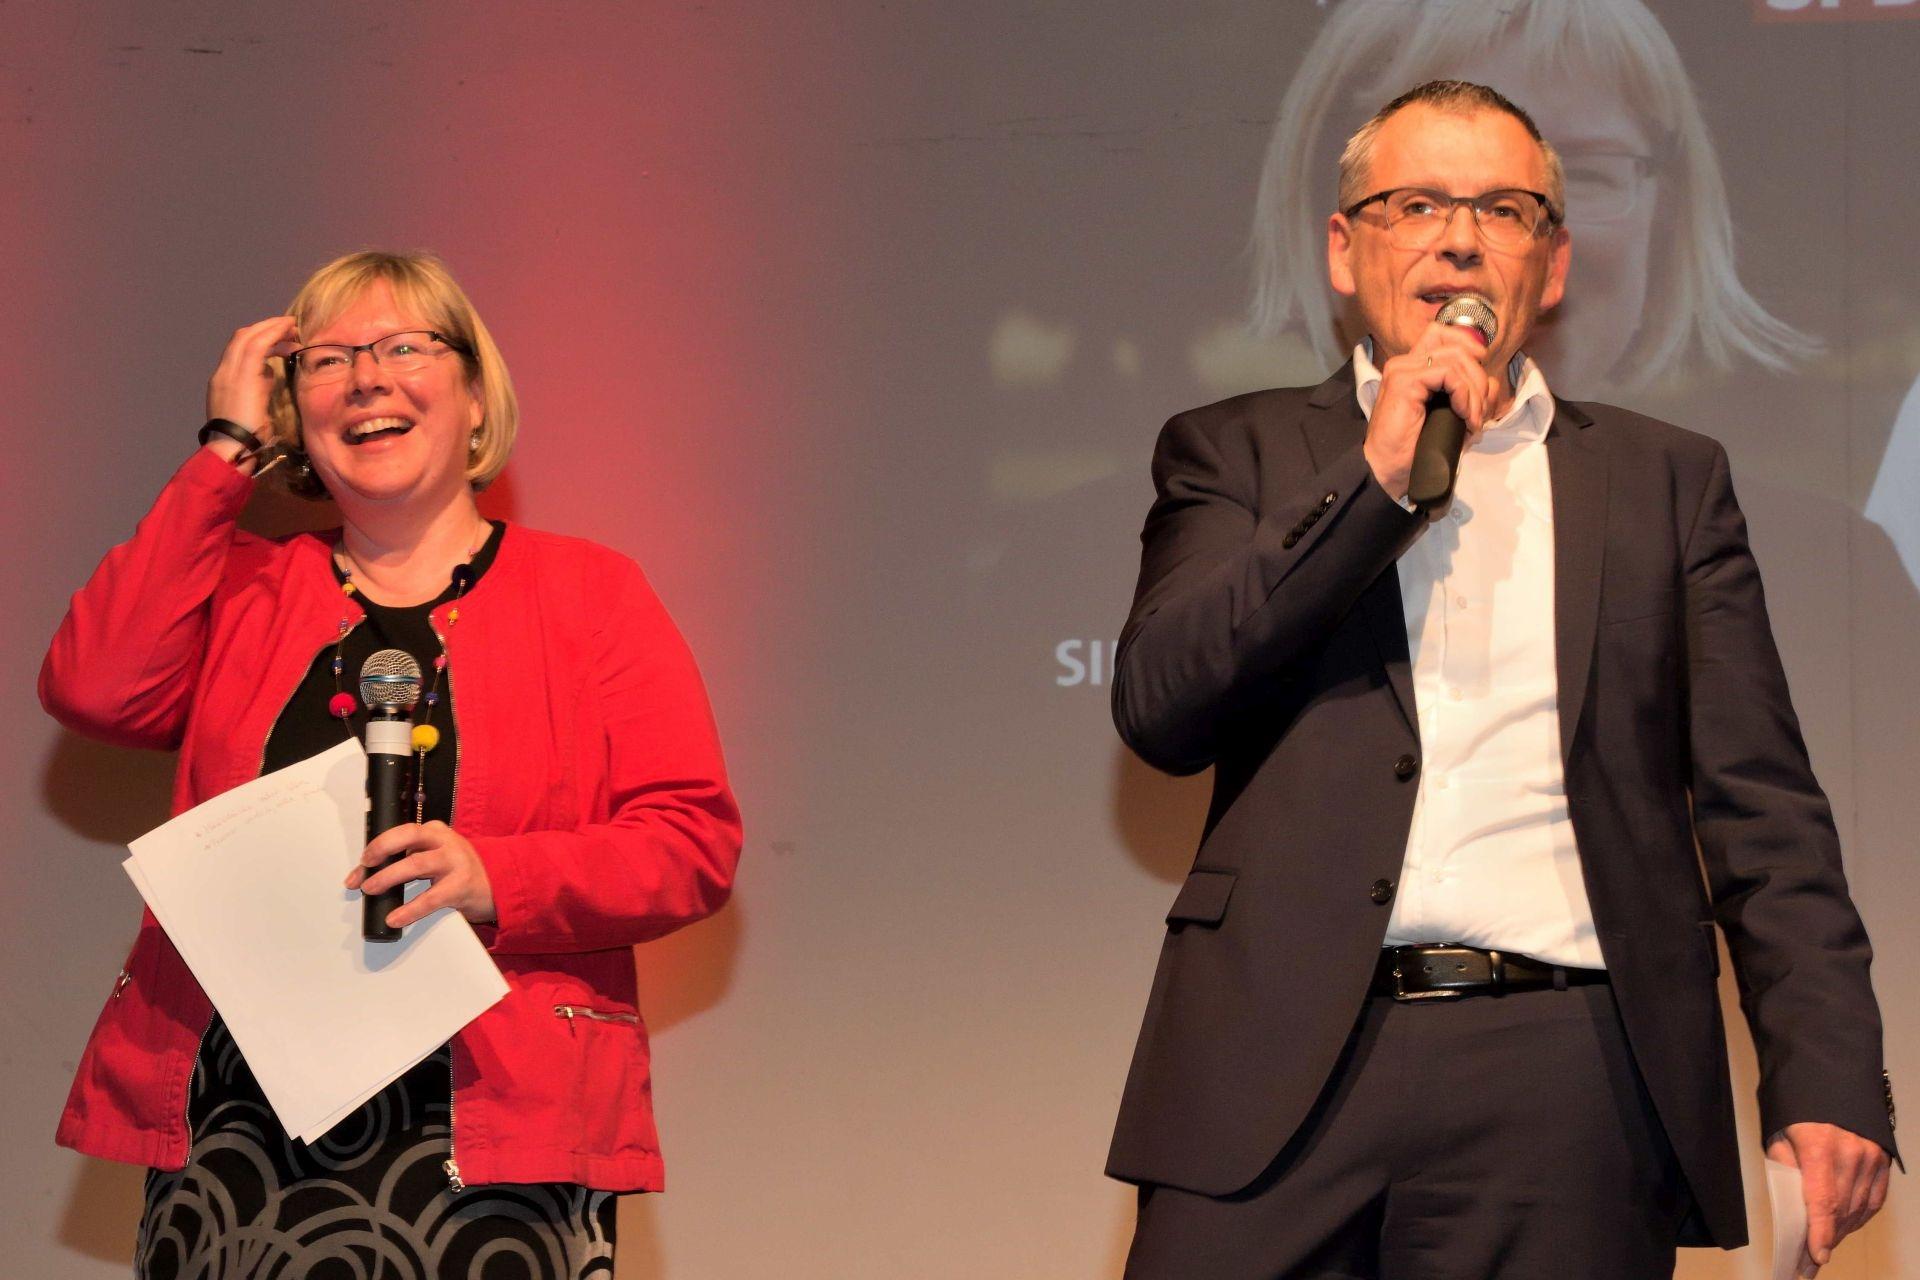 Neujahrsempfang 2020: Silke Engler, Andreas Siebert